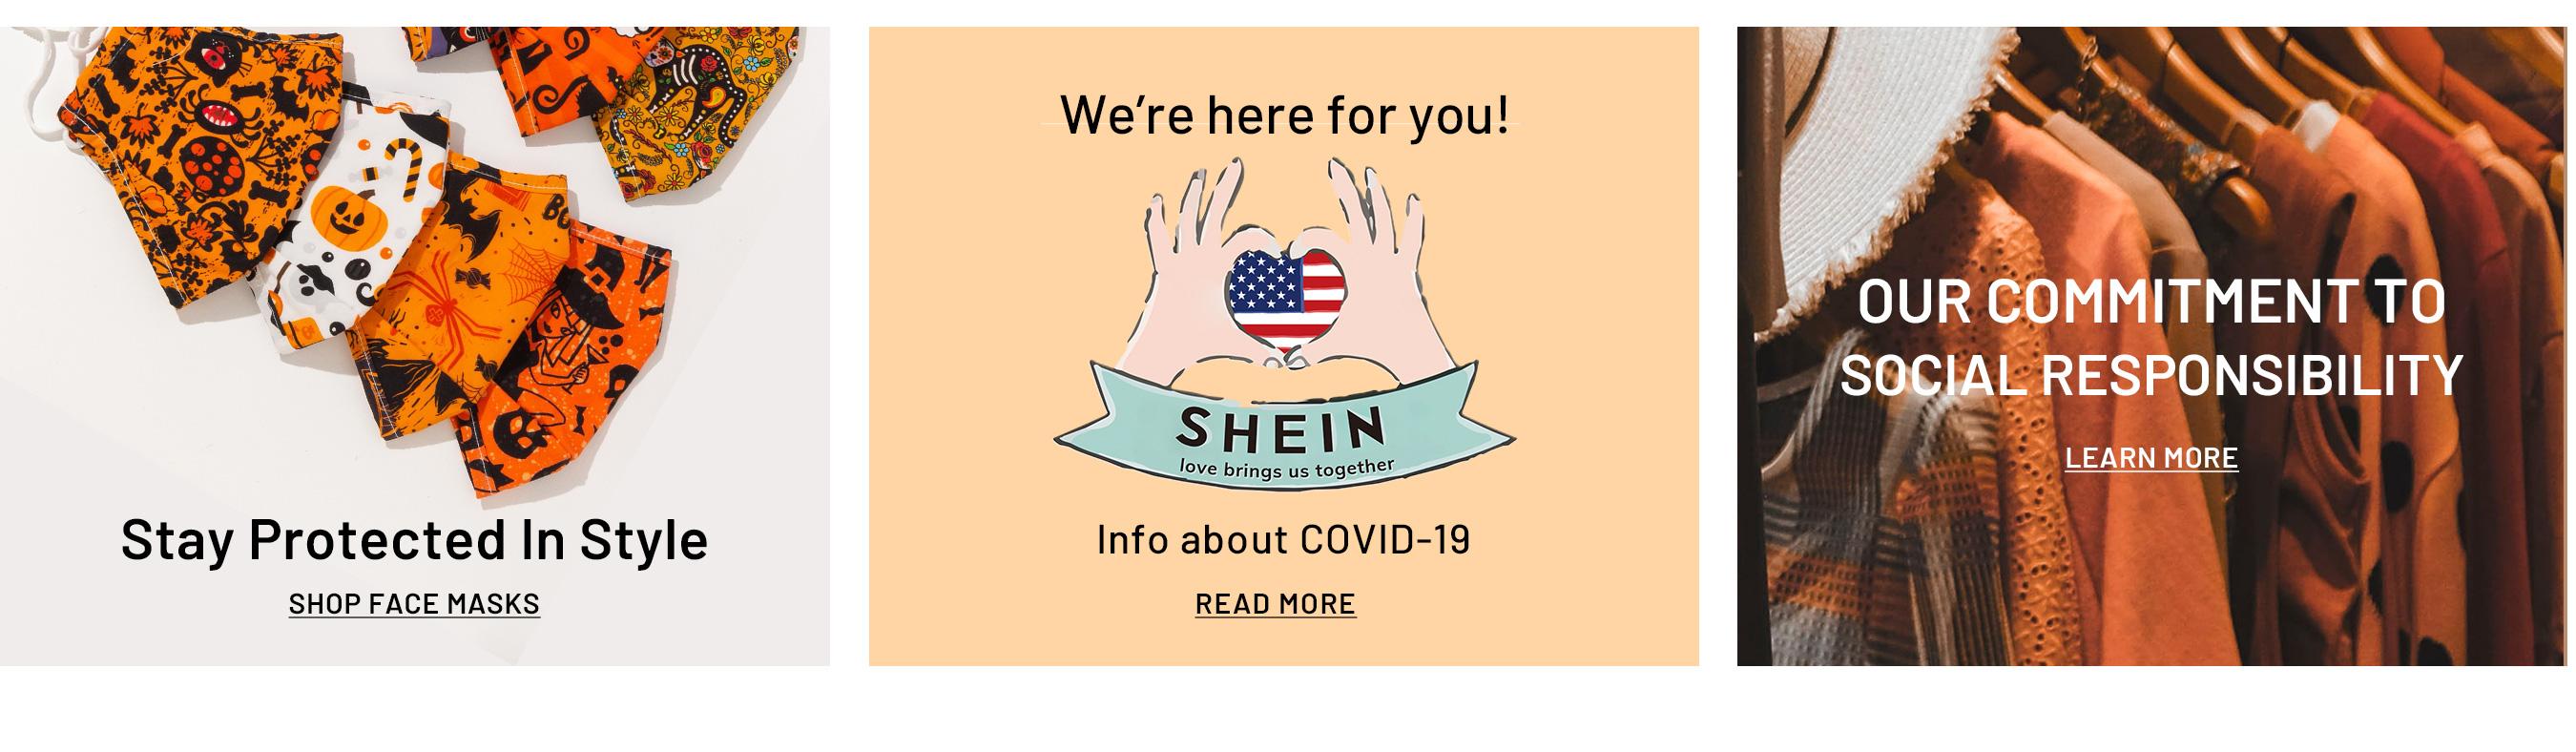 Shein Coupons - Face Masks starting at just $4